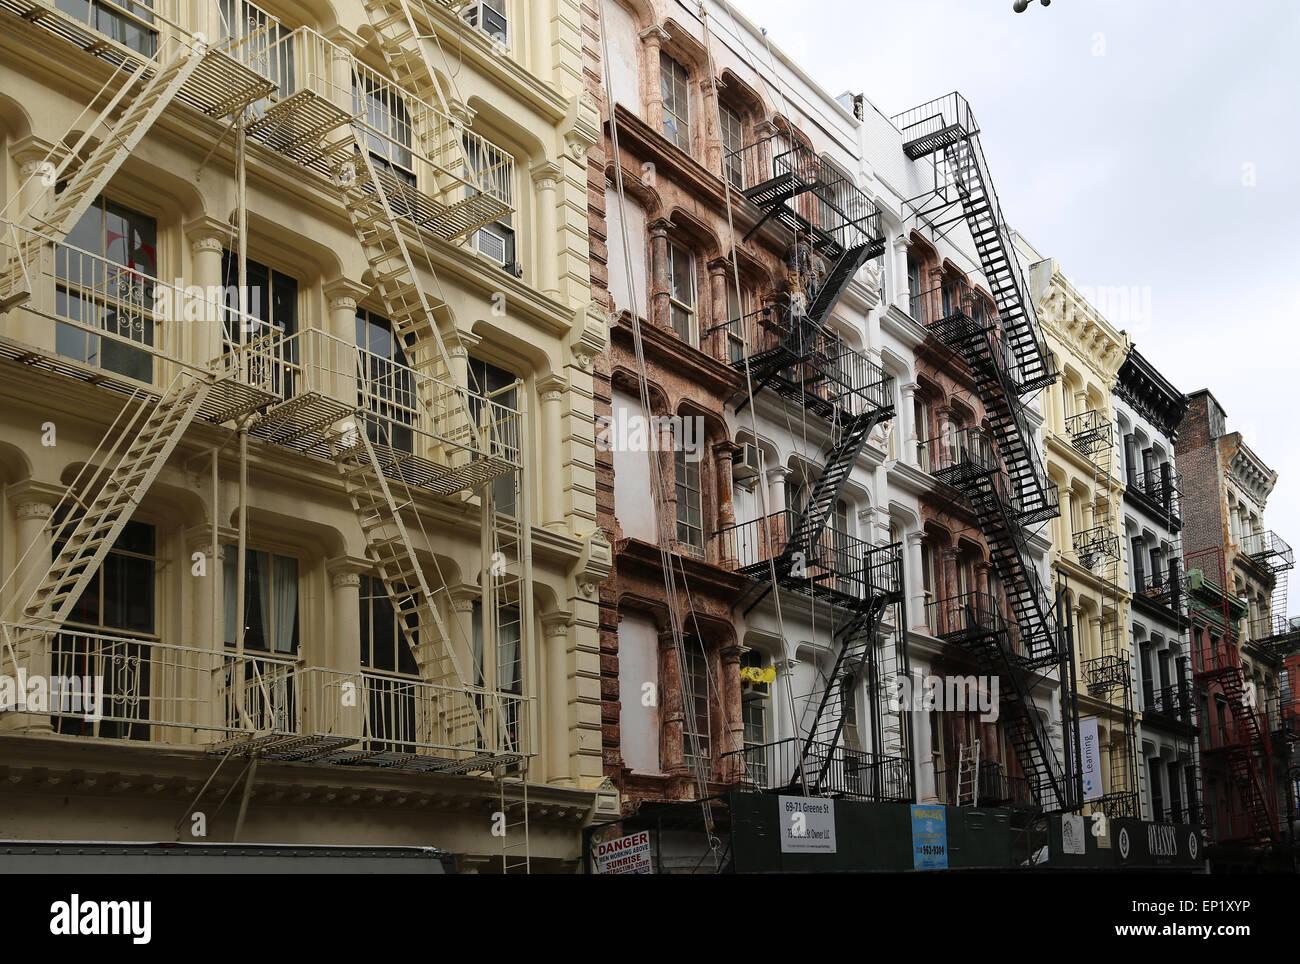 United States. New York City. Lower Manhattan. Soho. Fire escape. - Stock Image